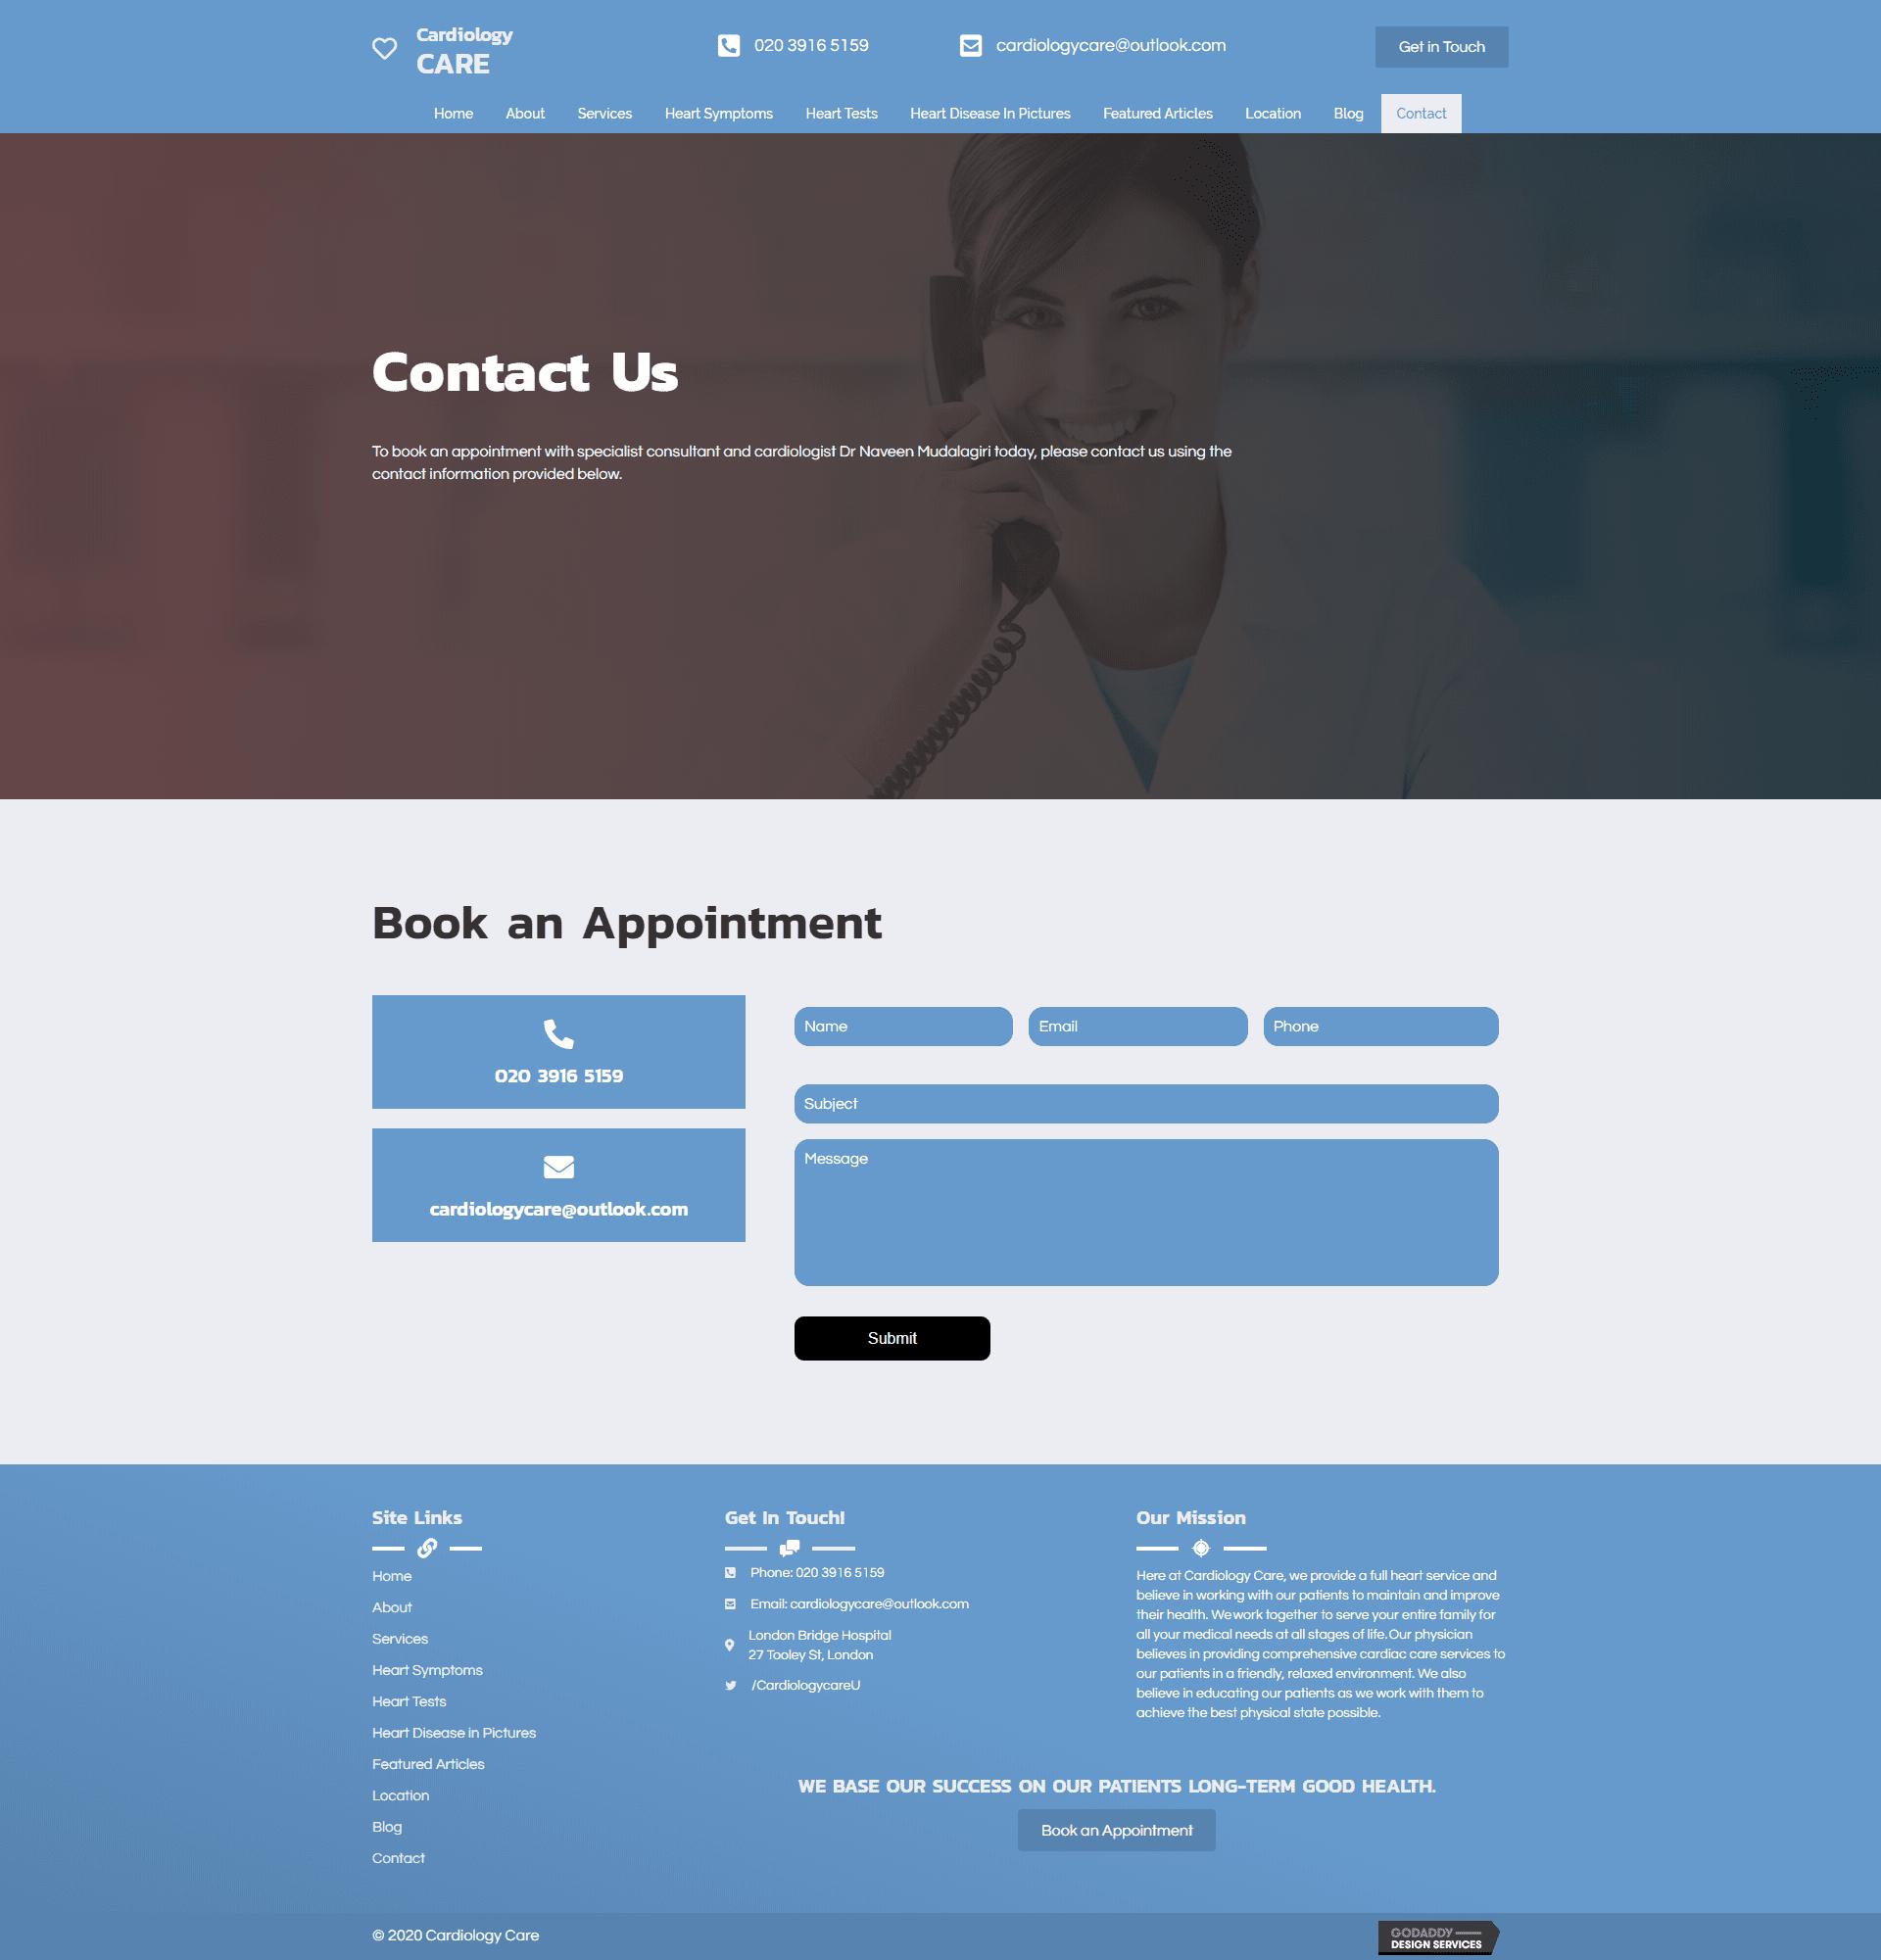 screencapture-cardiologycare-uk-contact